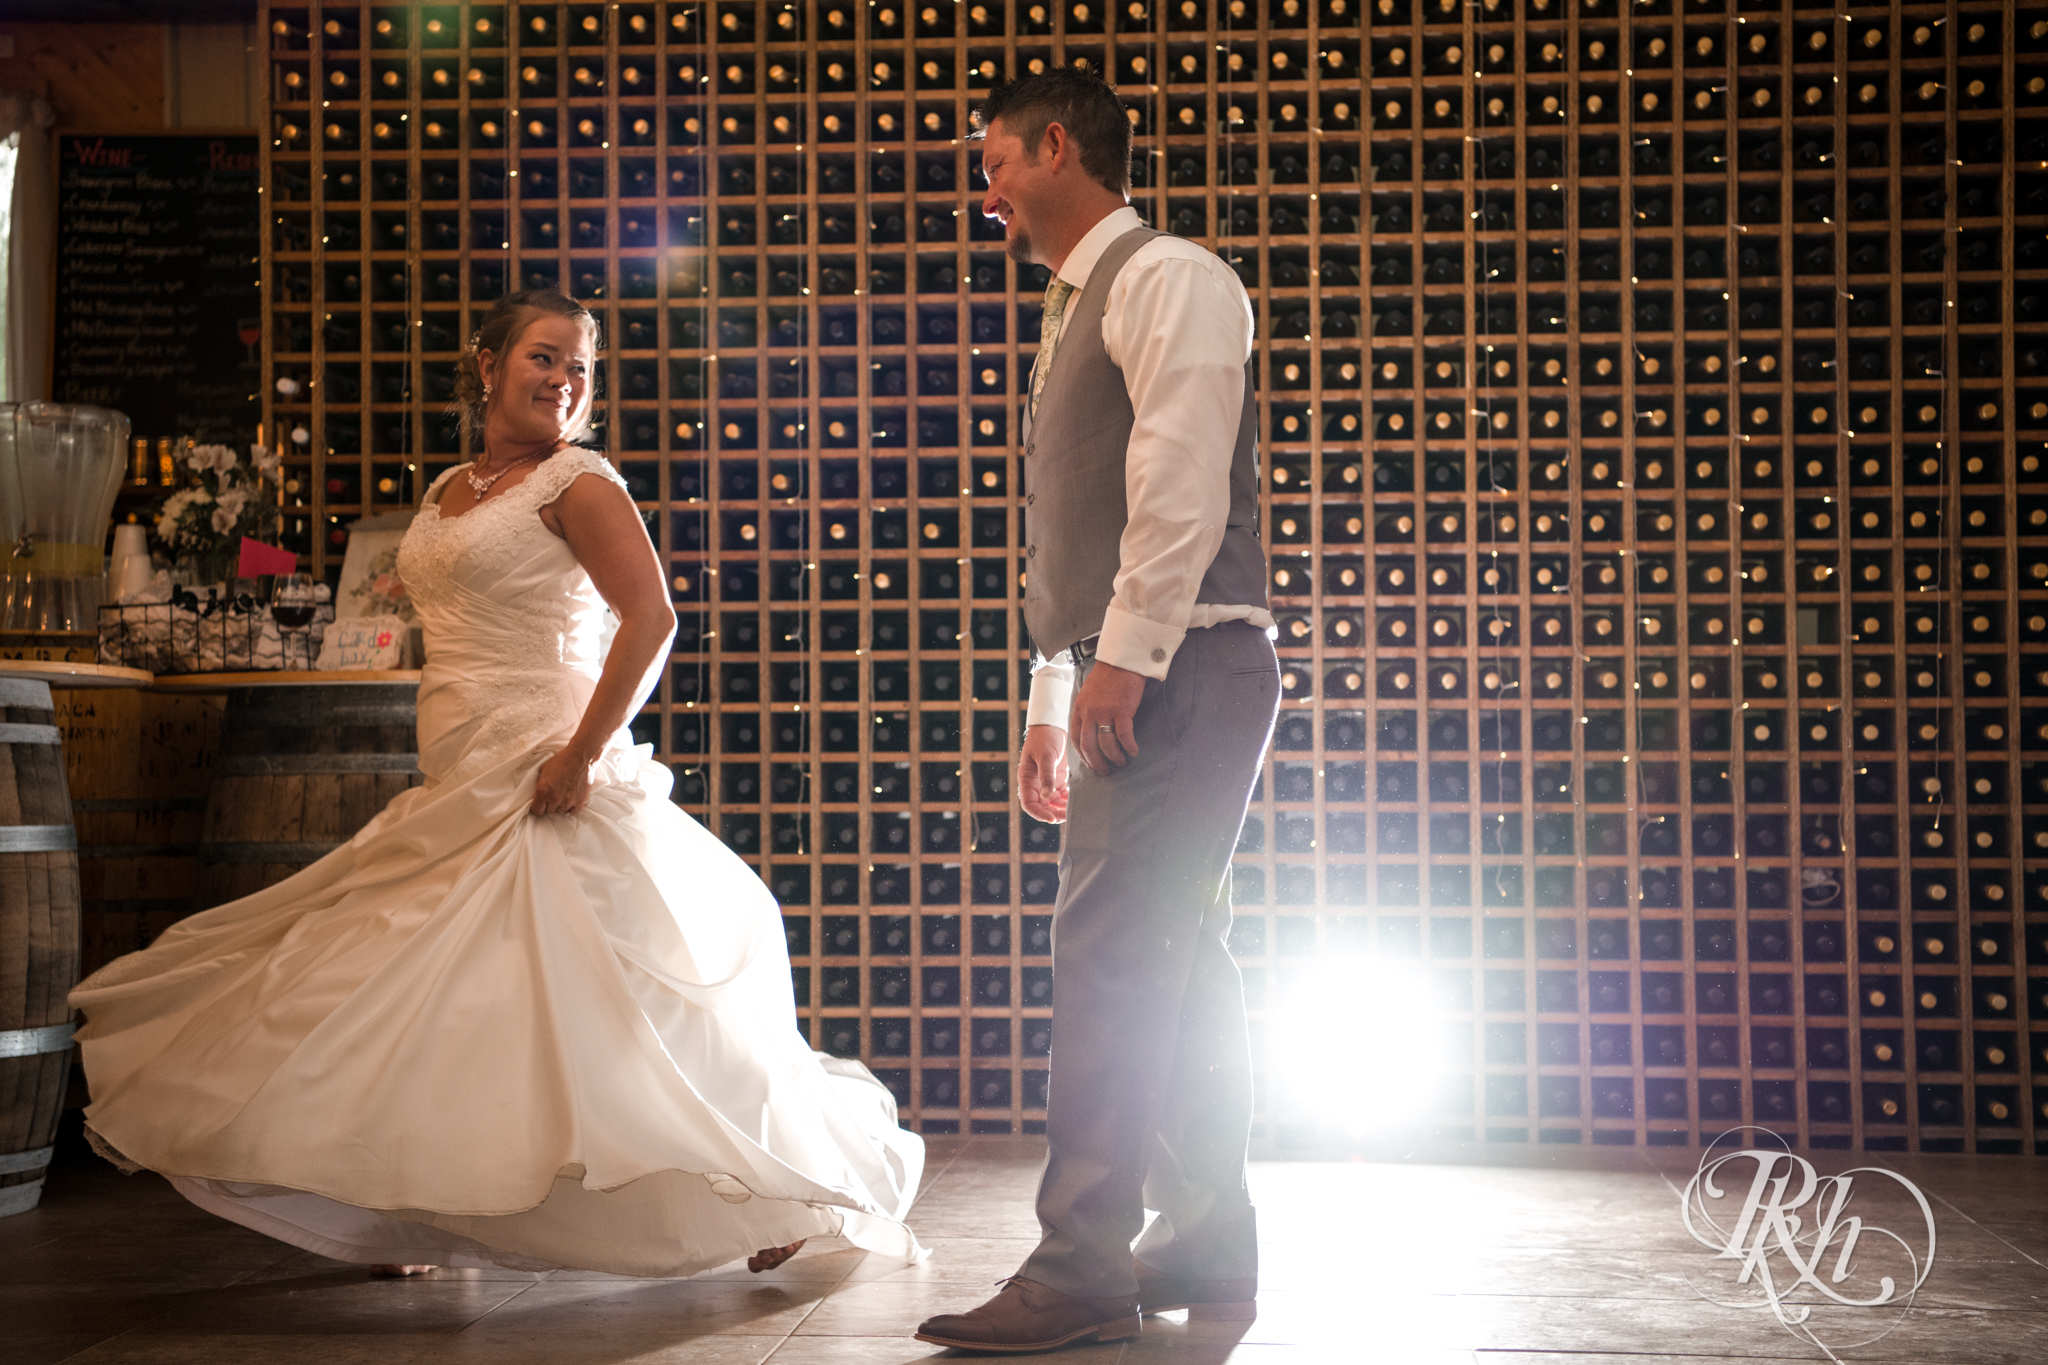 Ally & Nick - Minnesota Wedding Photography - Next Chapter Winery - RKH Images - Blog (41 of 57).jpg